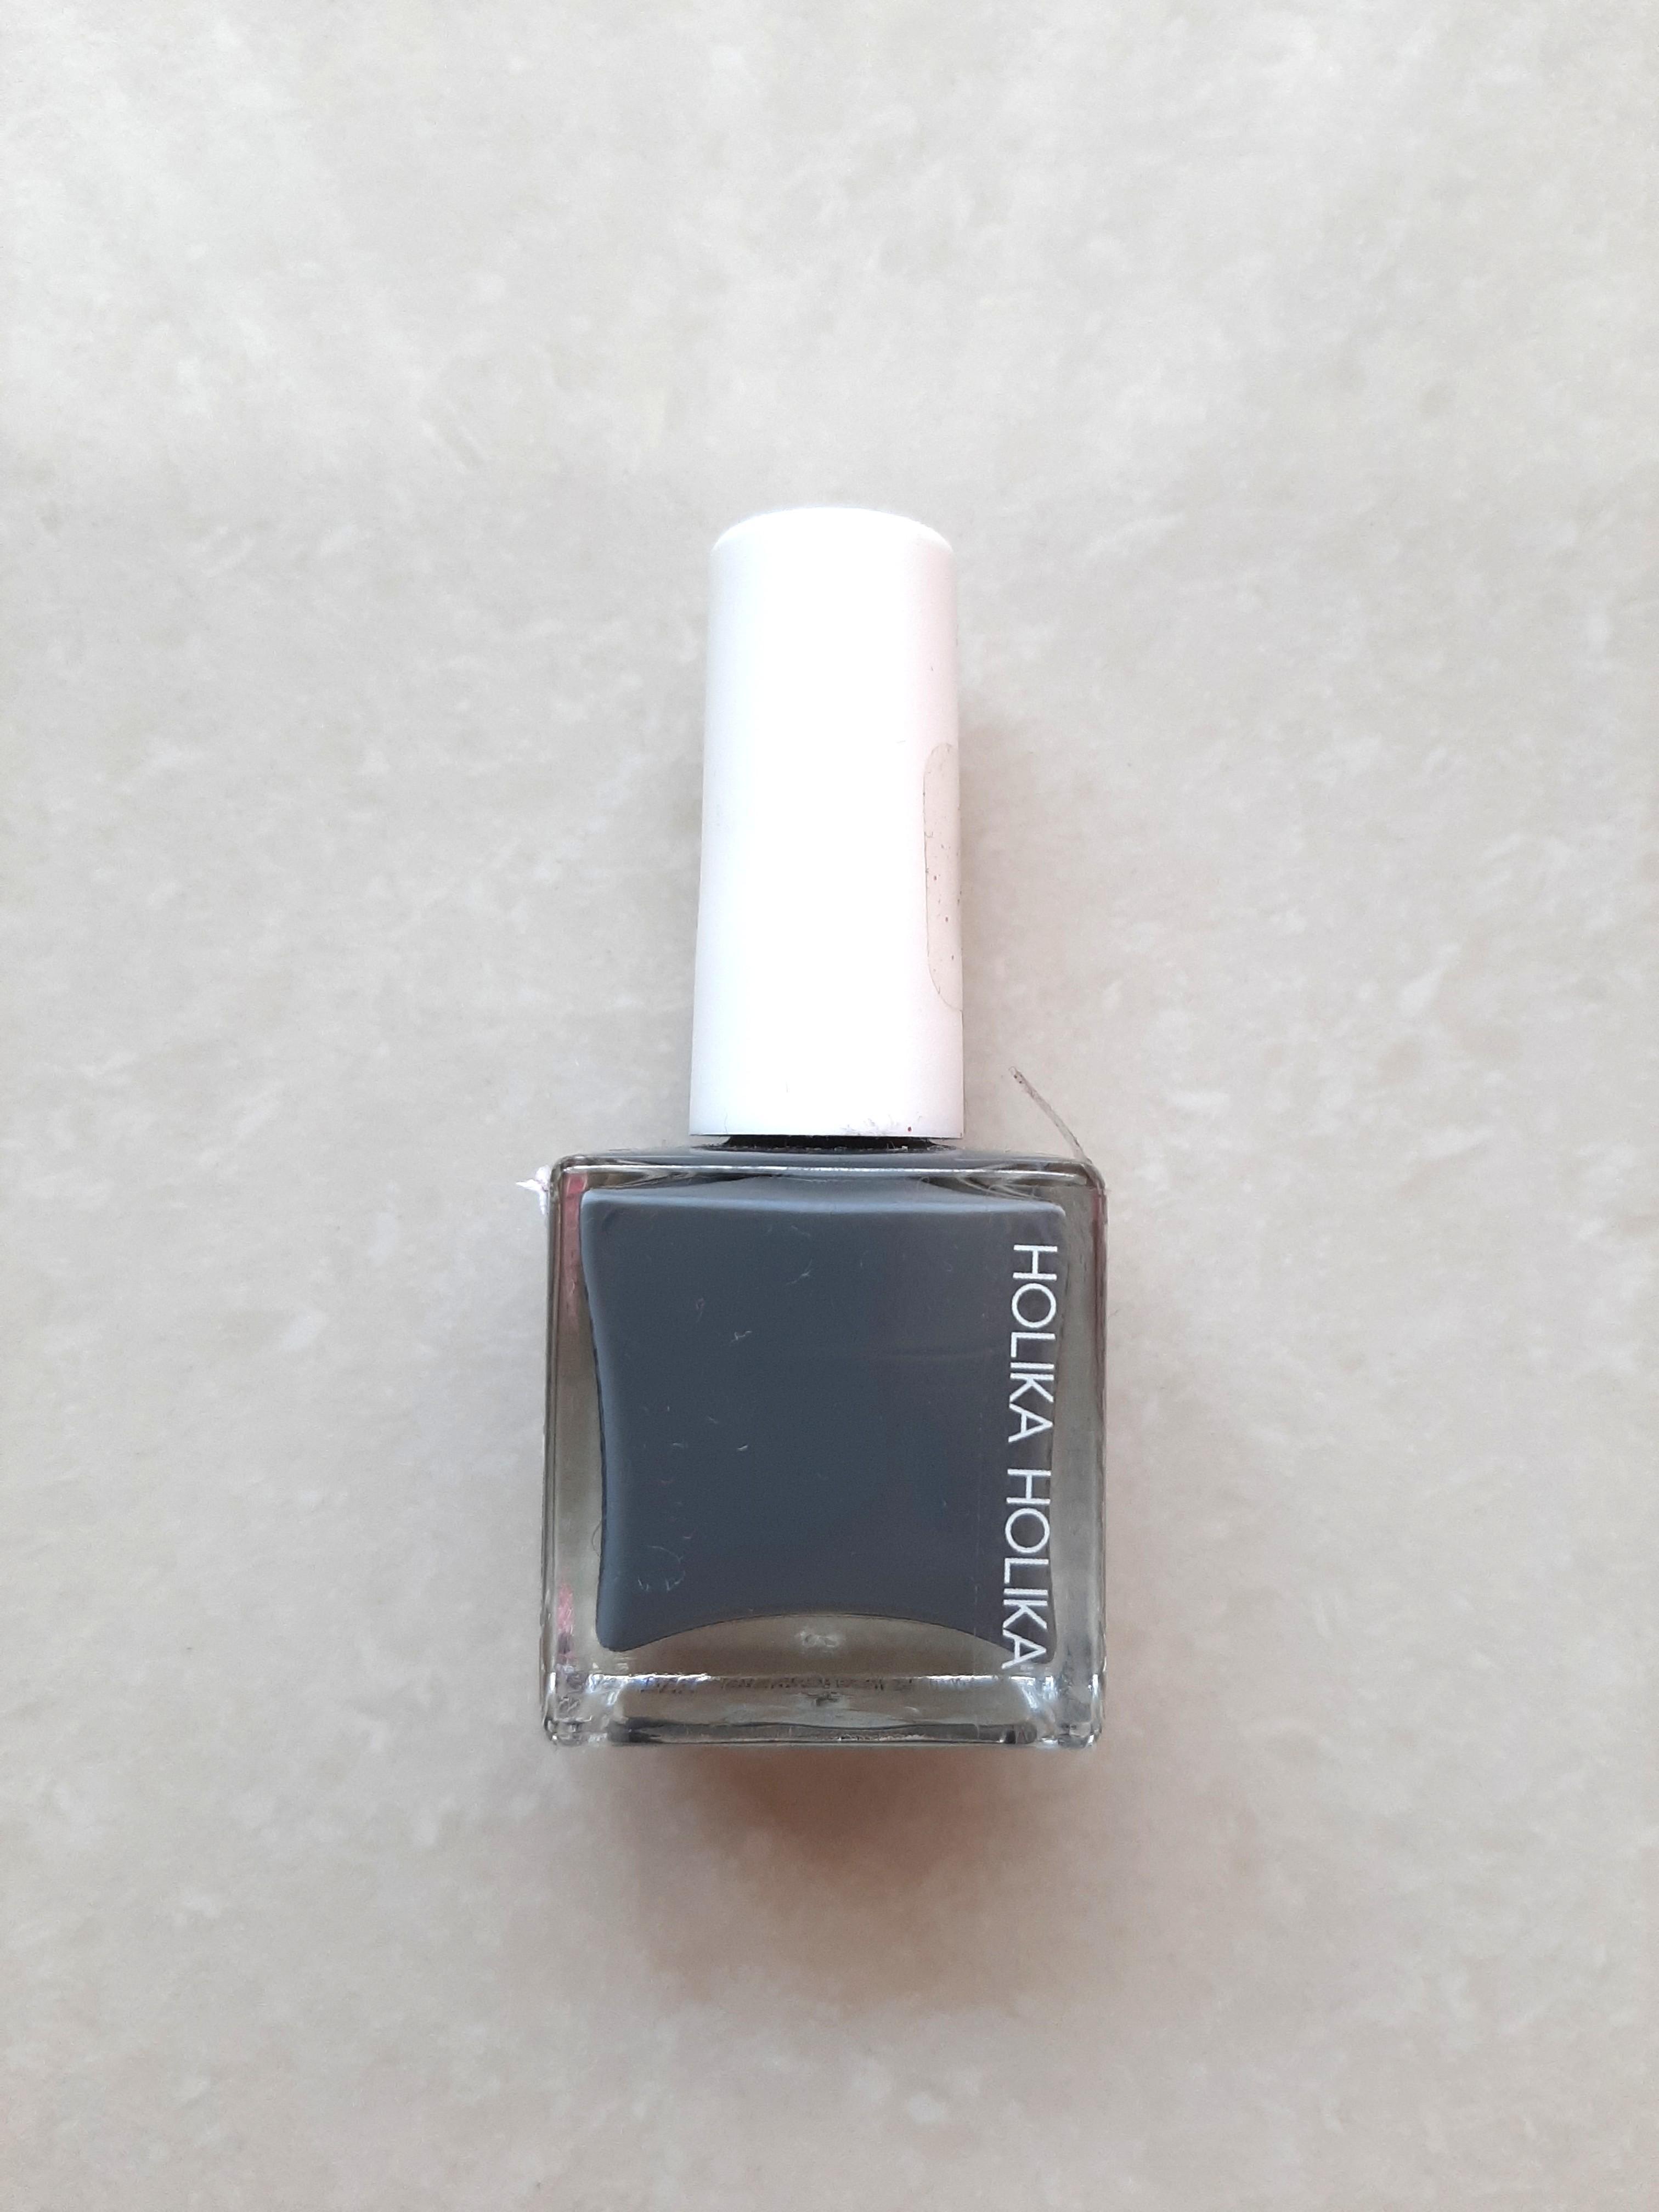 Holika holika GY02 nail polish kutek abu-abu